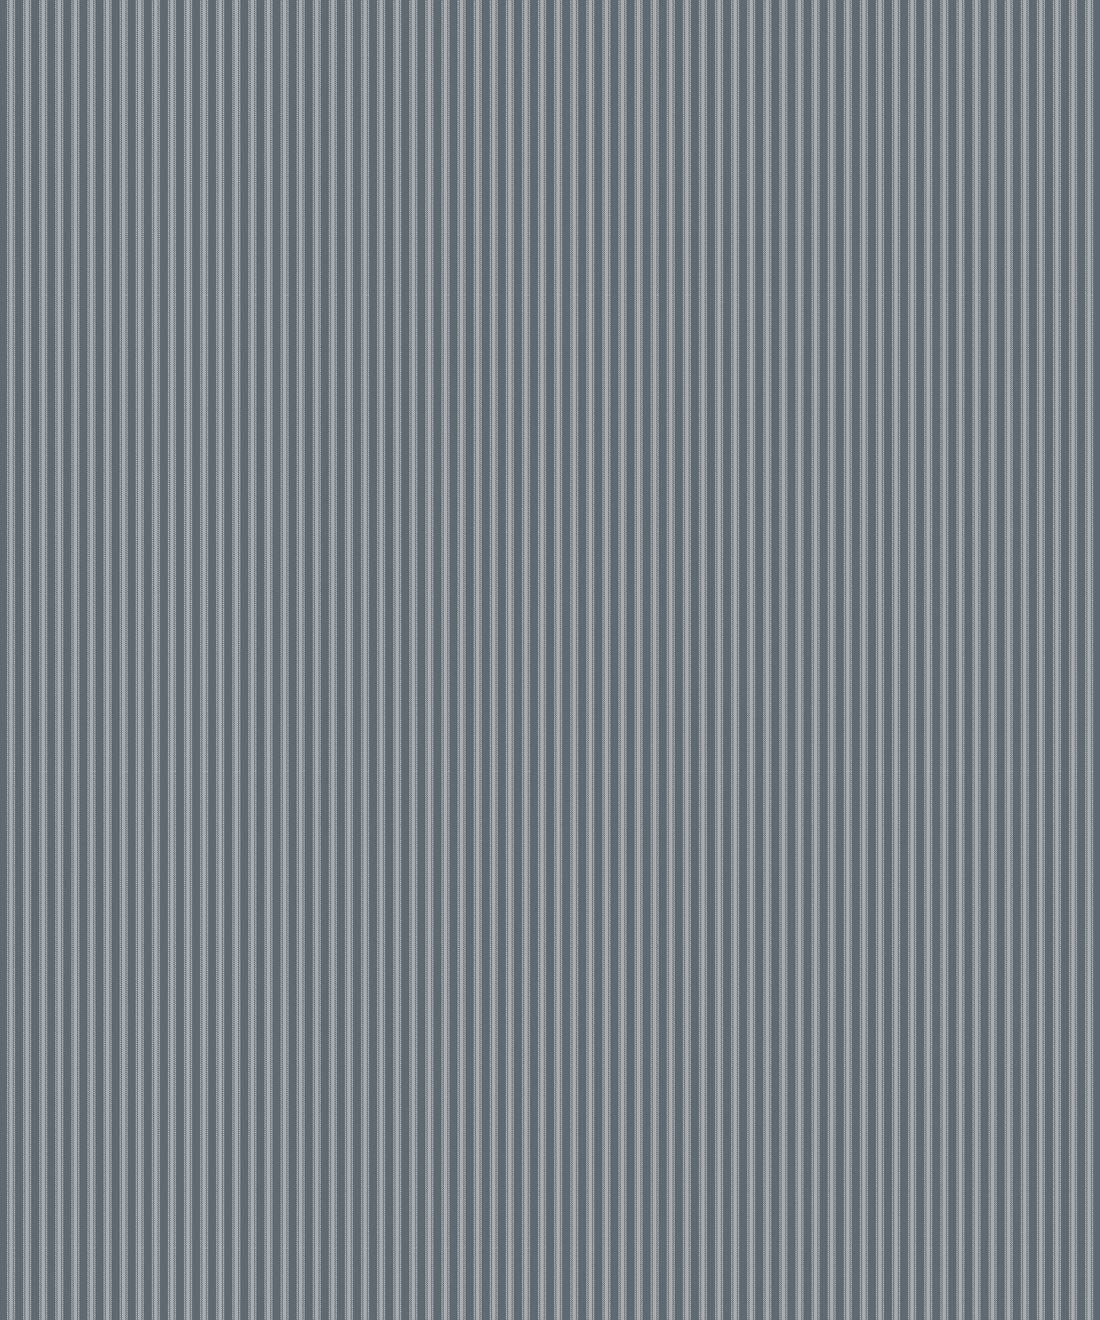 Ticking Stripe Wallpaper • Grey Wallpaper • Swatch